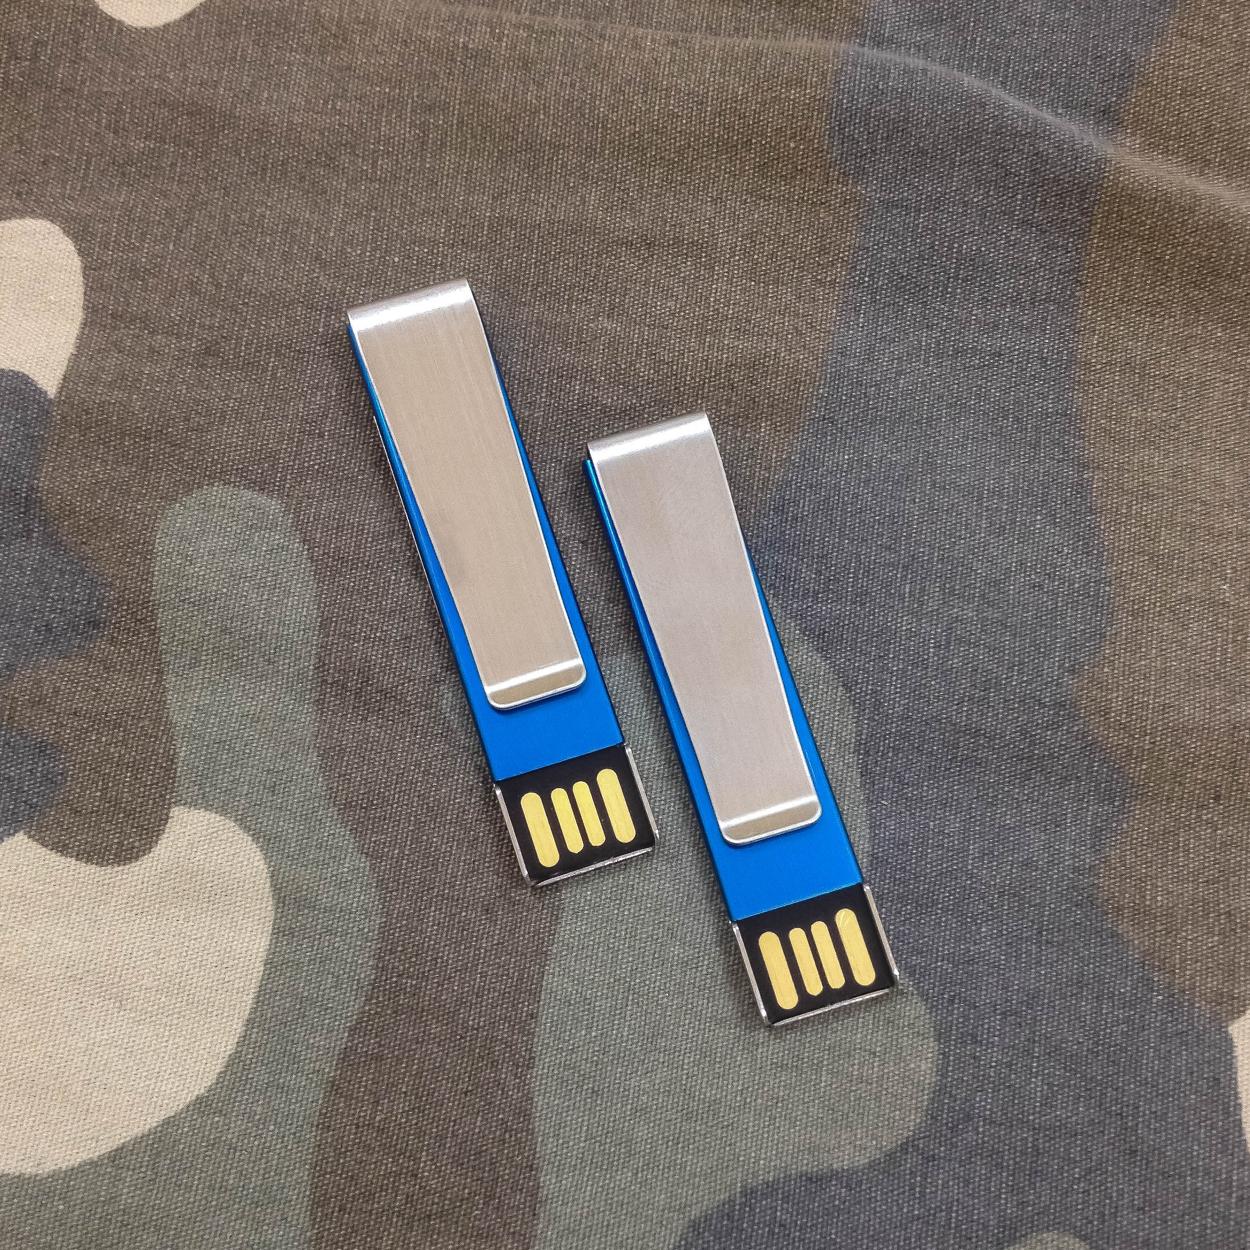 "USB Flash 16 Gb с зажимом + гравировка на заказ!  - Интернет-магазин ""GravPresent"" в Харькове"